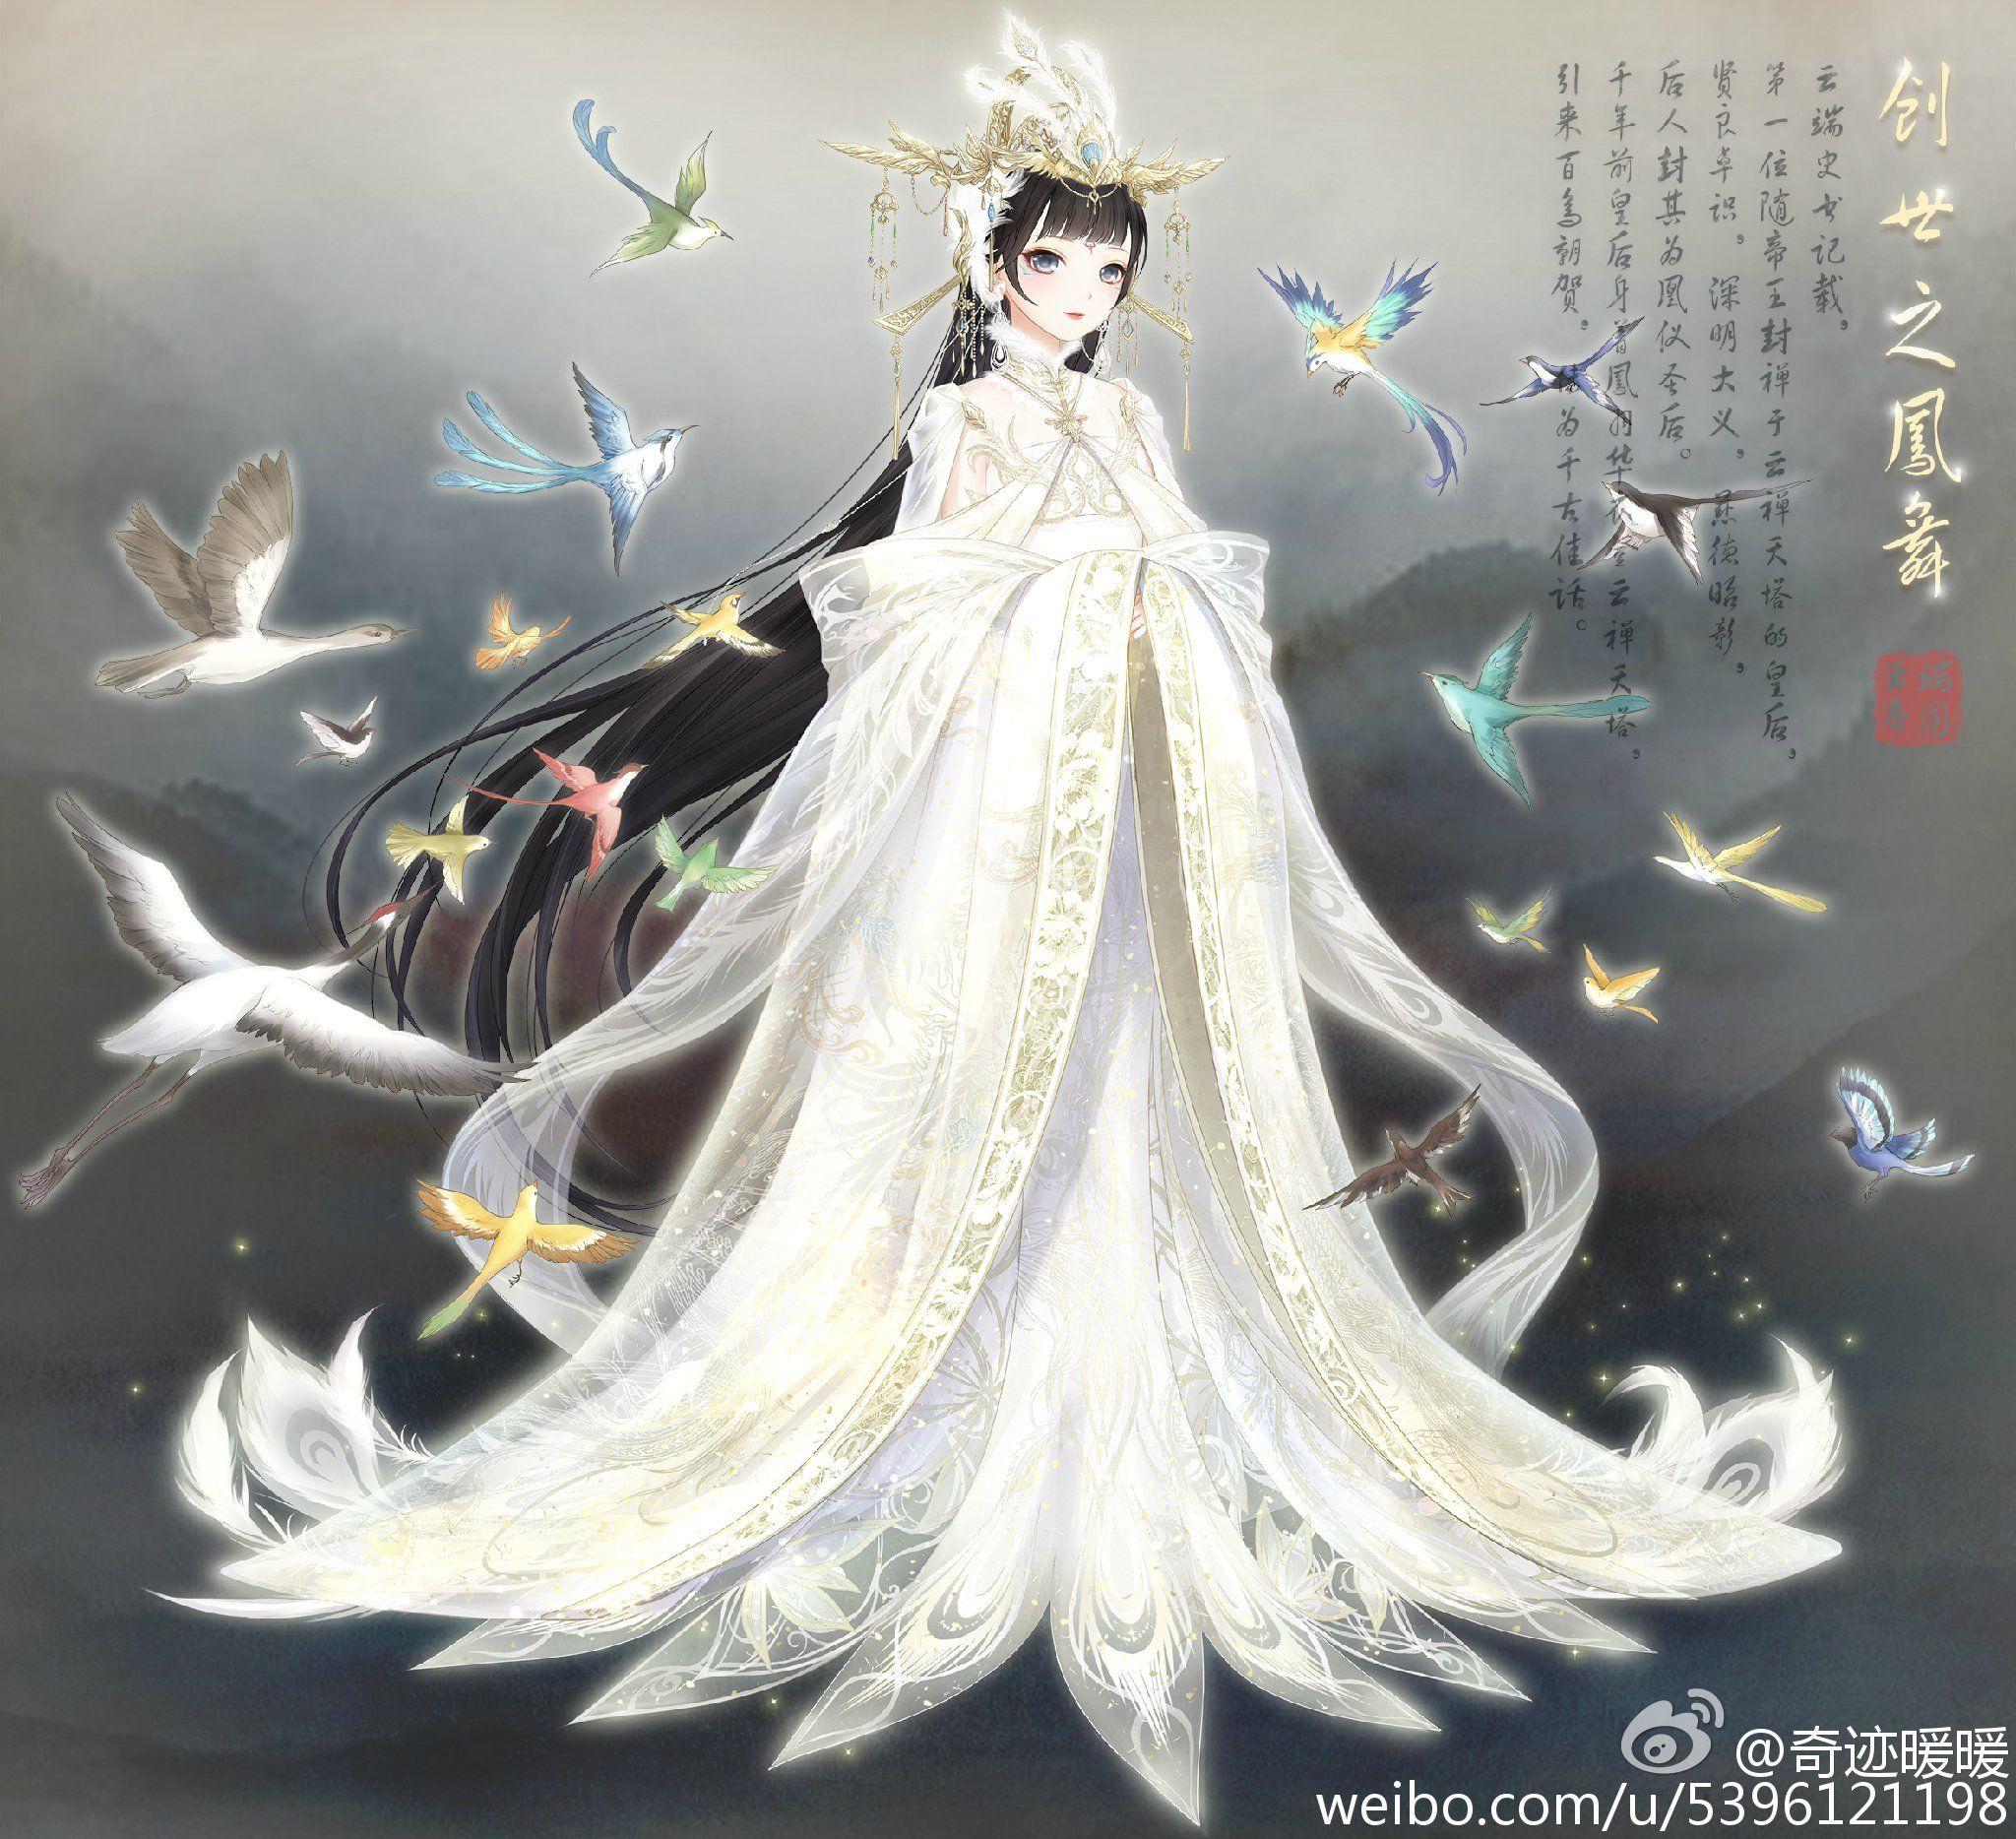 White Phoenix Of Genesis Anime 26 Pinterest Anime Manga And Characters